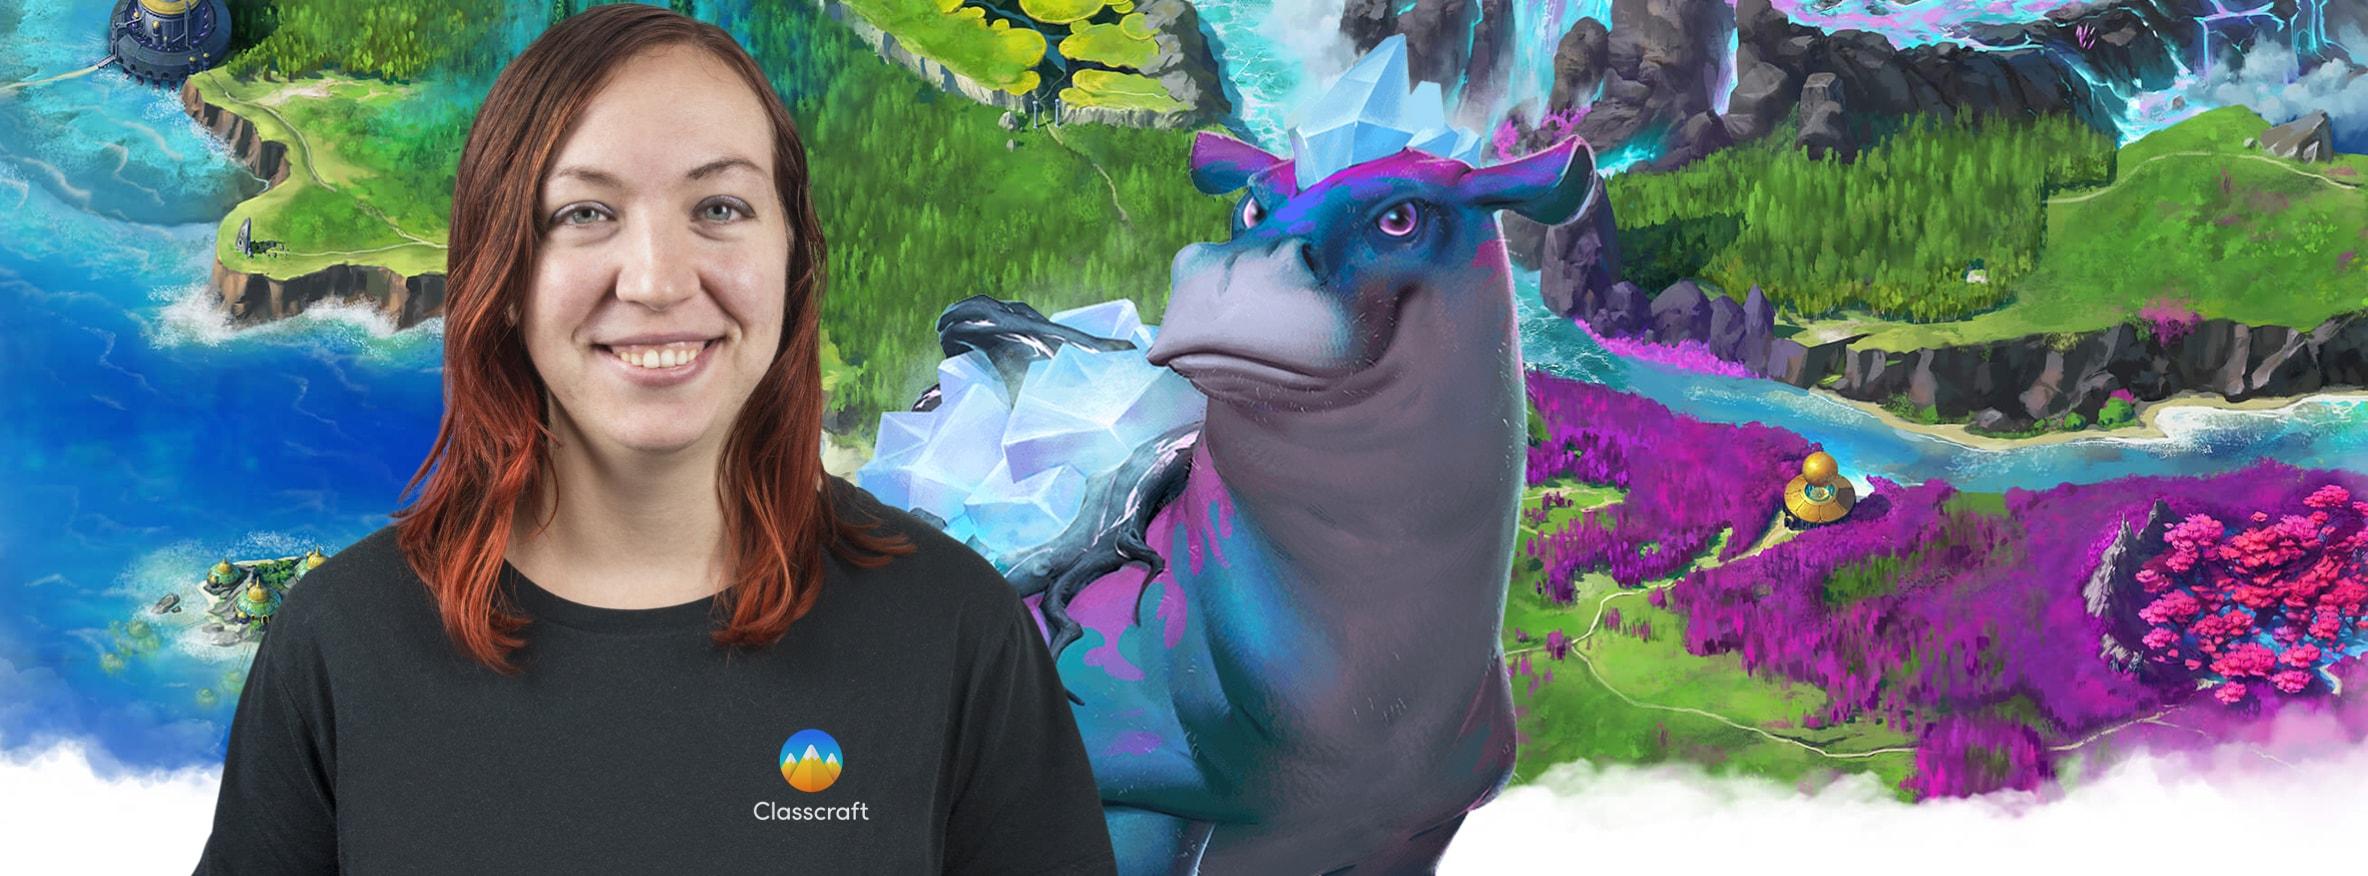 Stephanie Carmichael, Head of Storytelling team at Classcraft